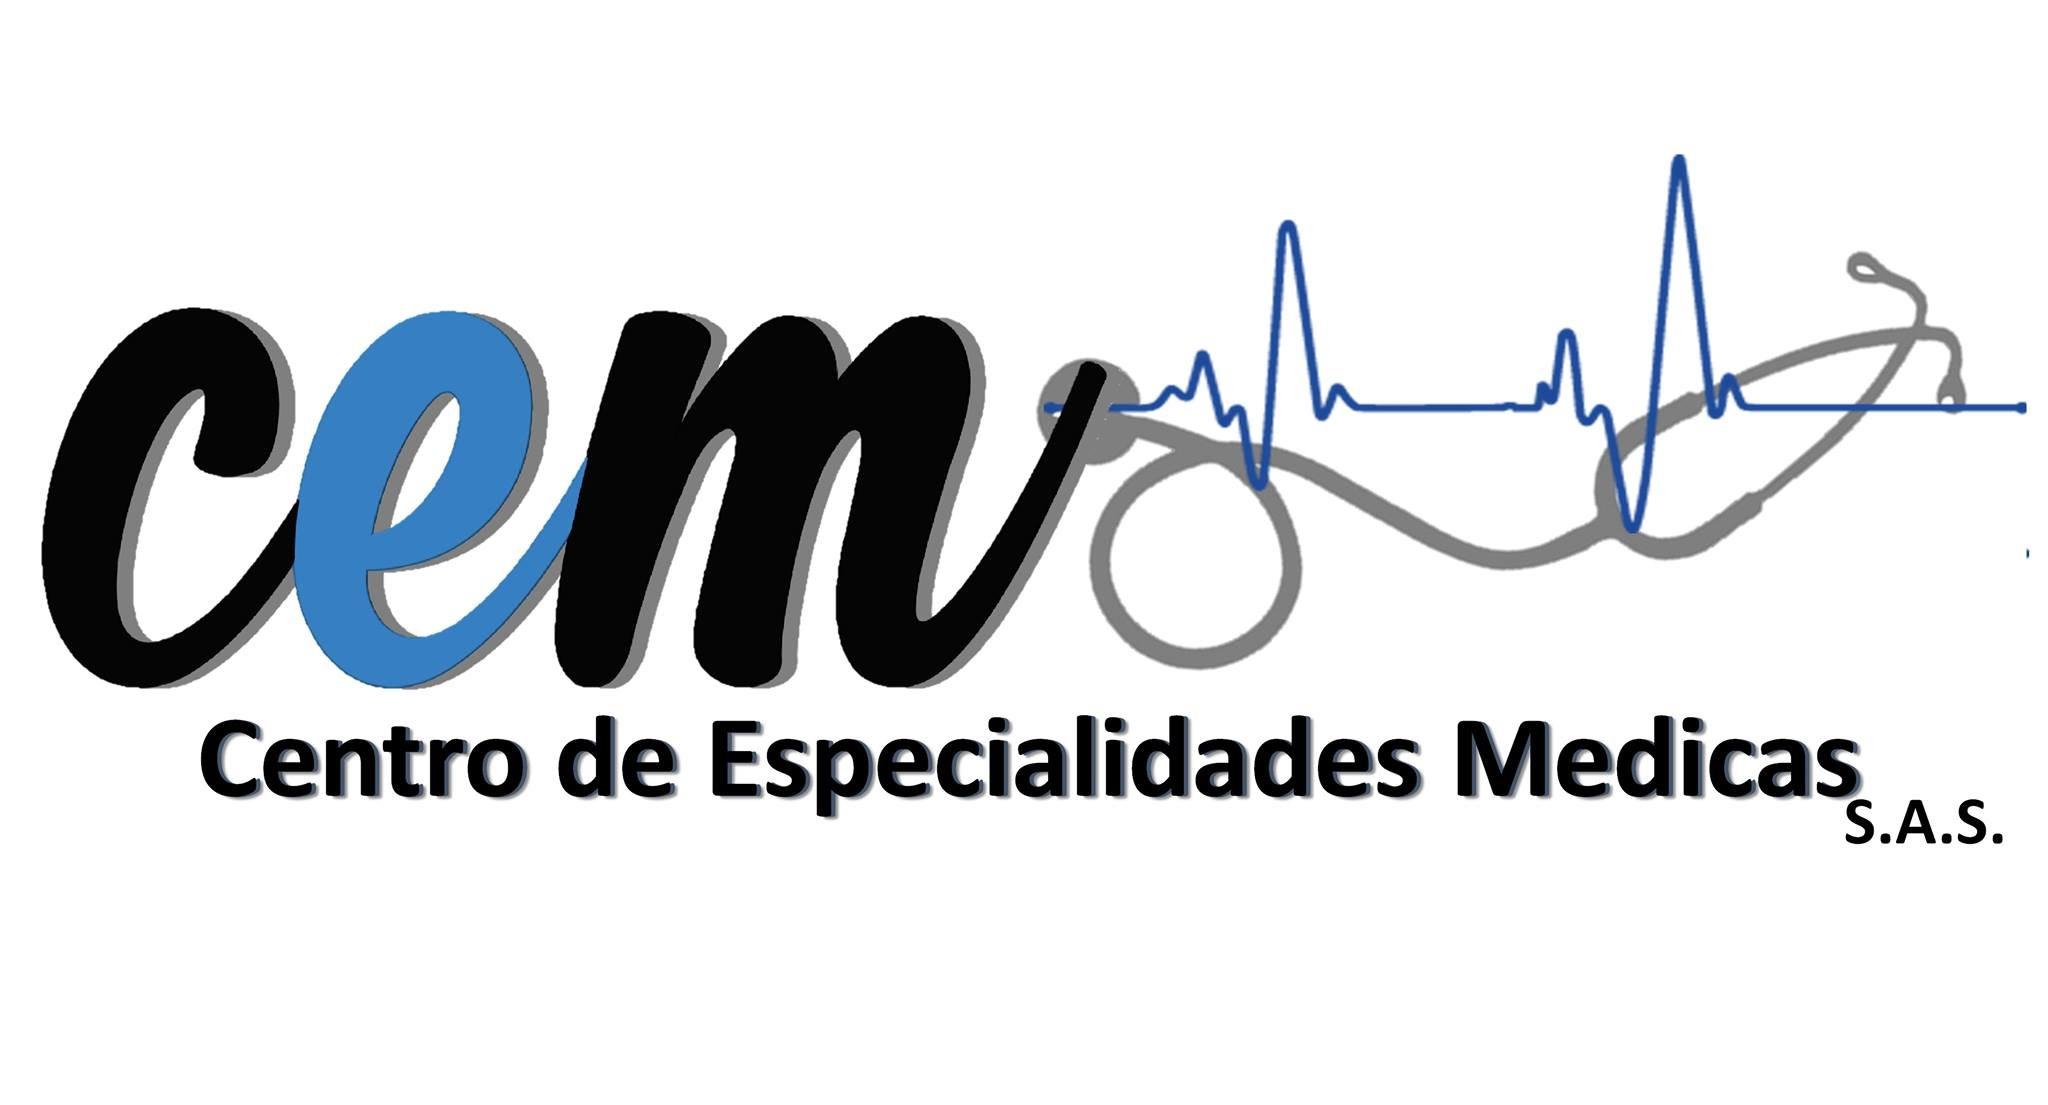 Centro de Especialidades Medicas